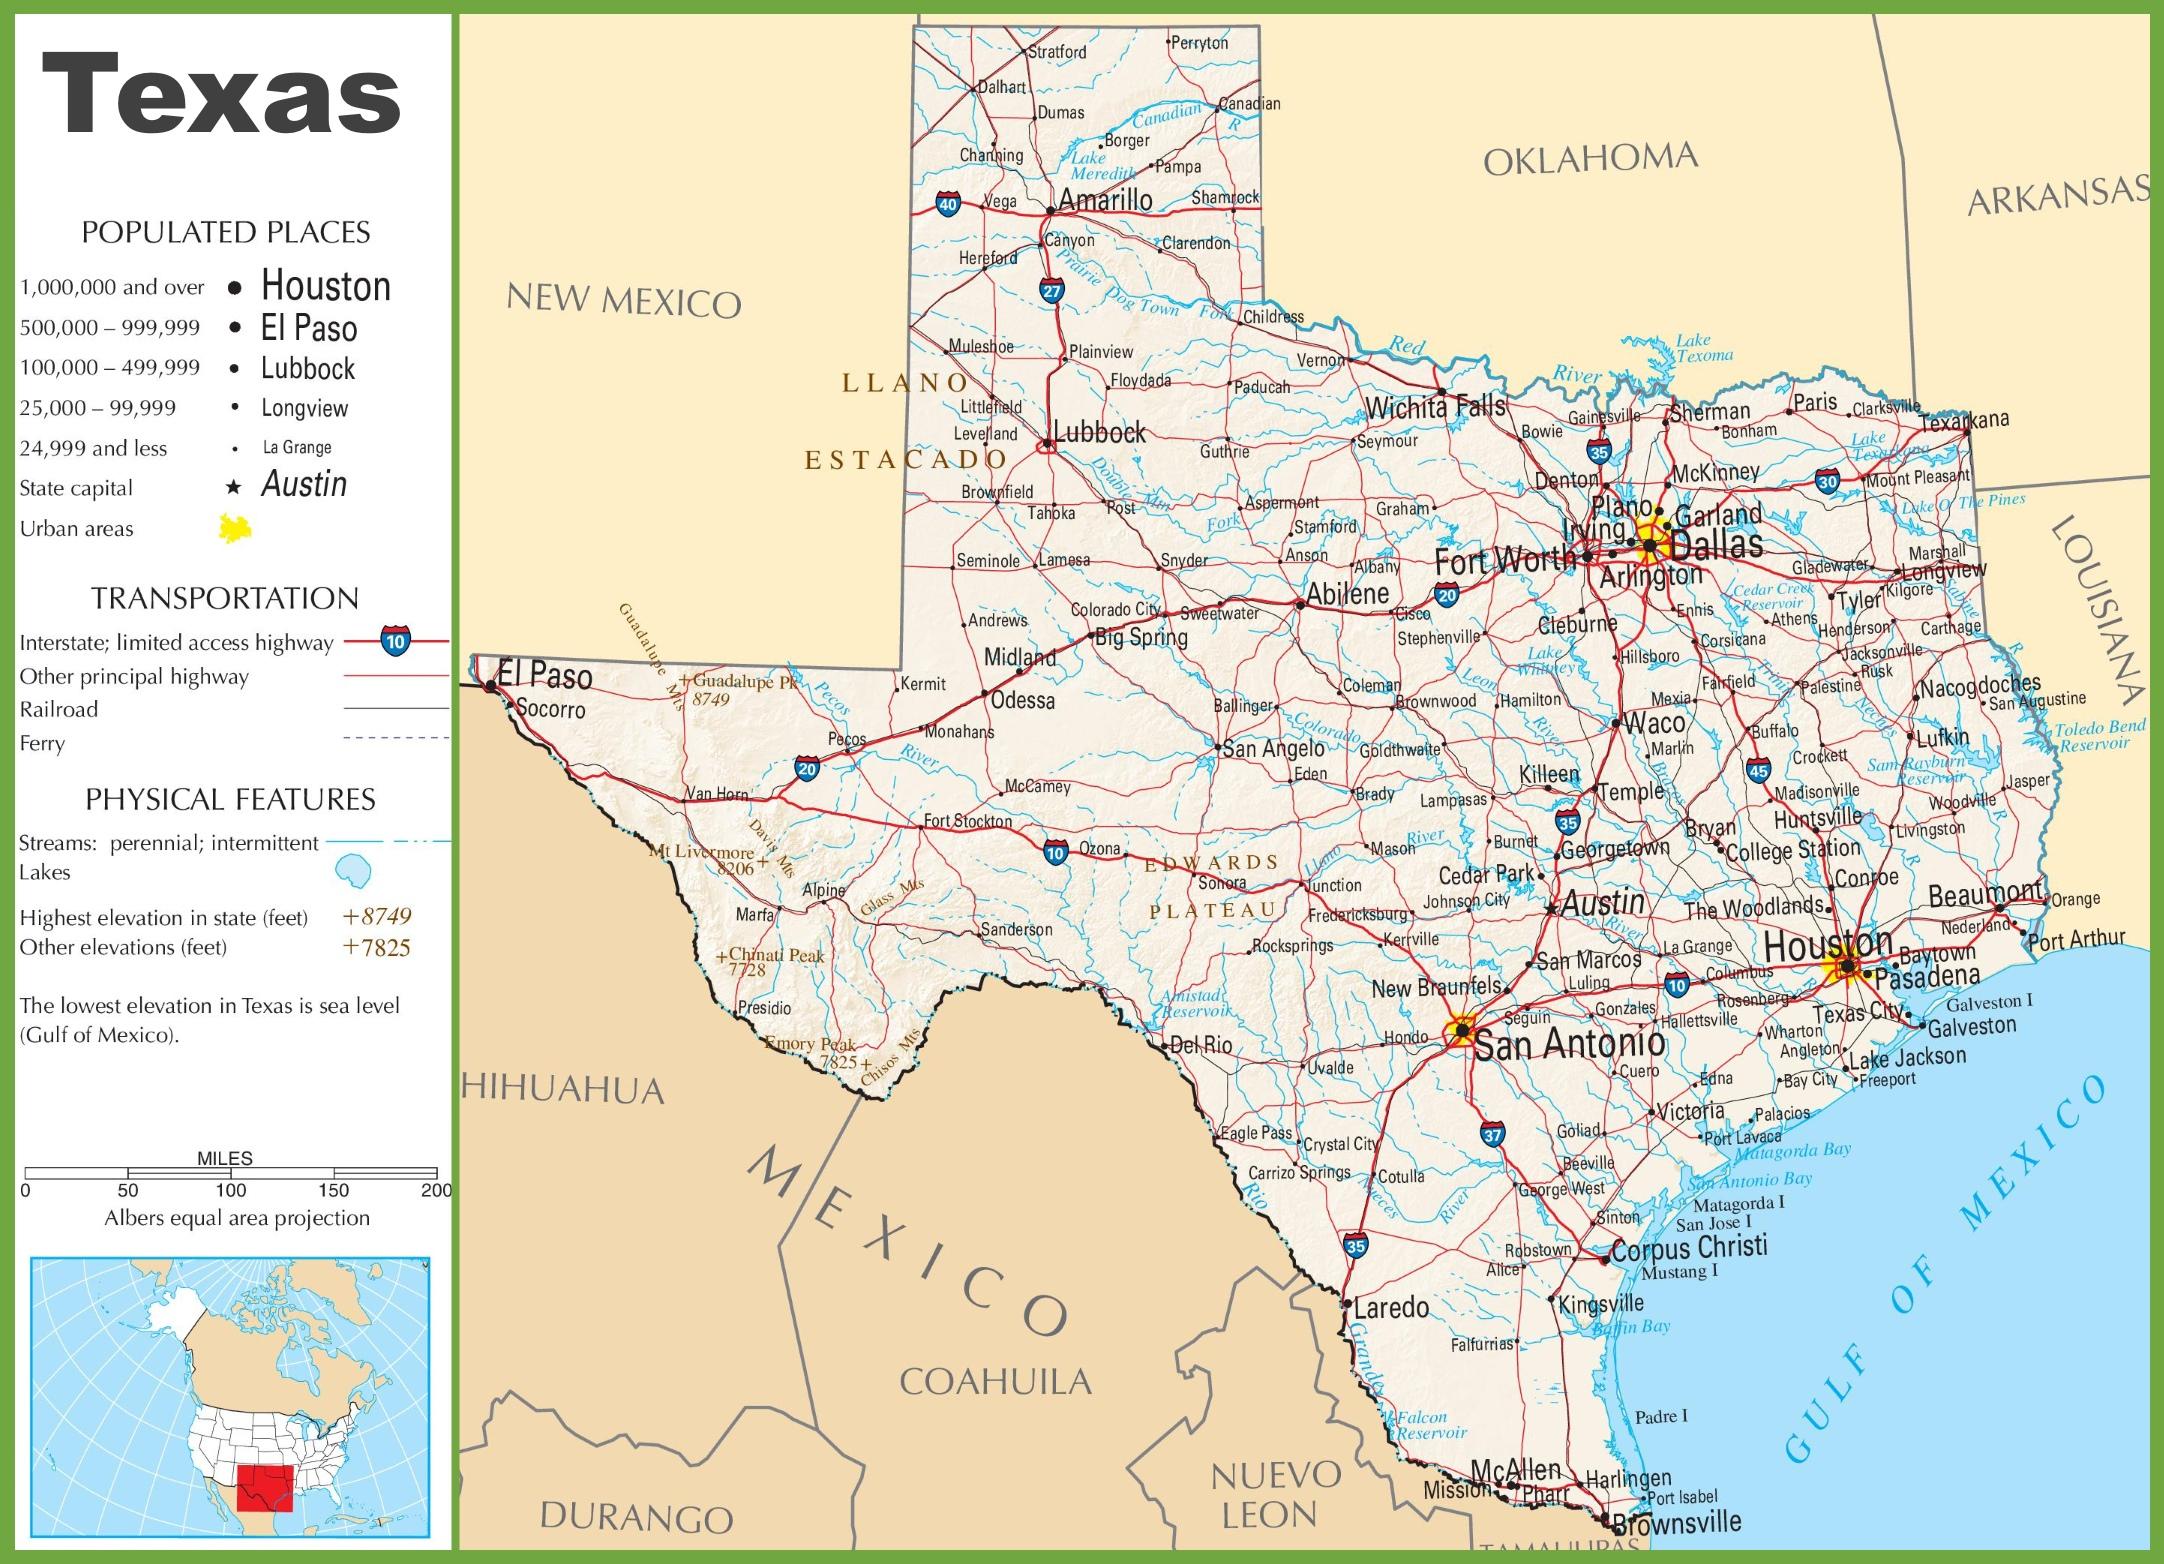 Texas Highway Map - Road Map Of Texas Highways